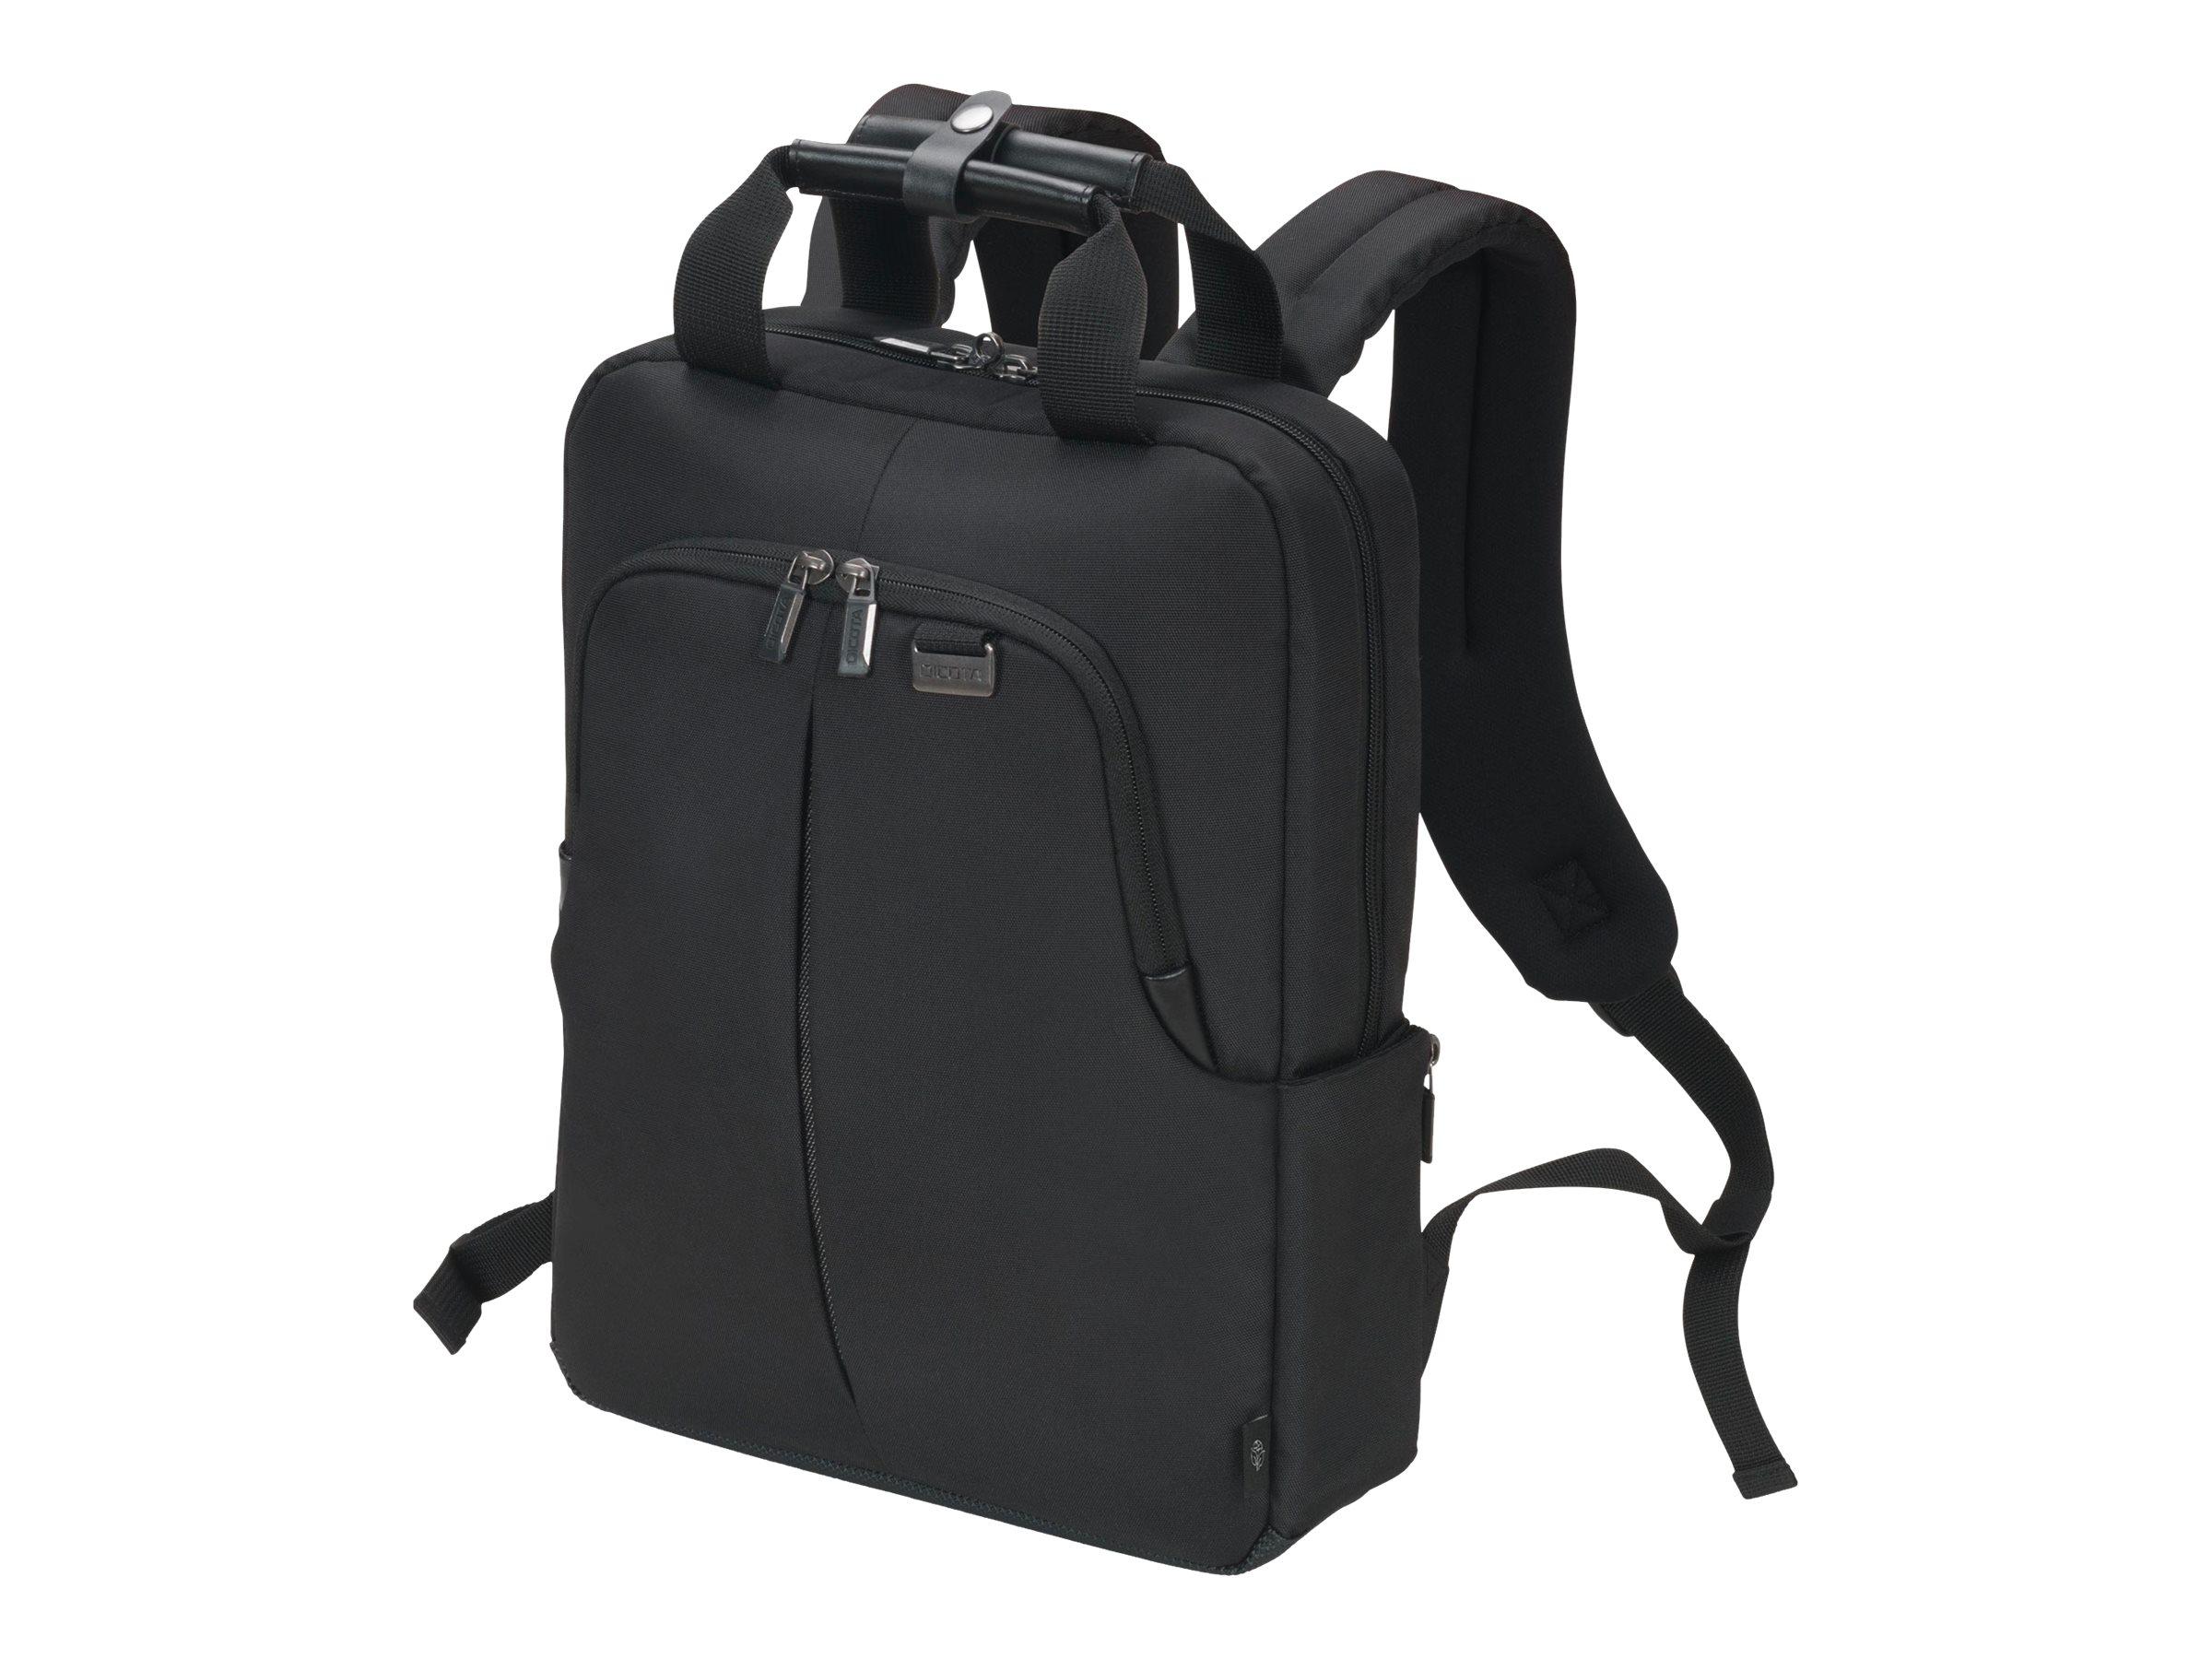 DICOTA Eco Backpack Slim PRO - Notebook-Rucksack - 35.8 cm - 12